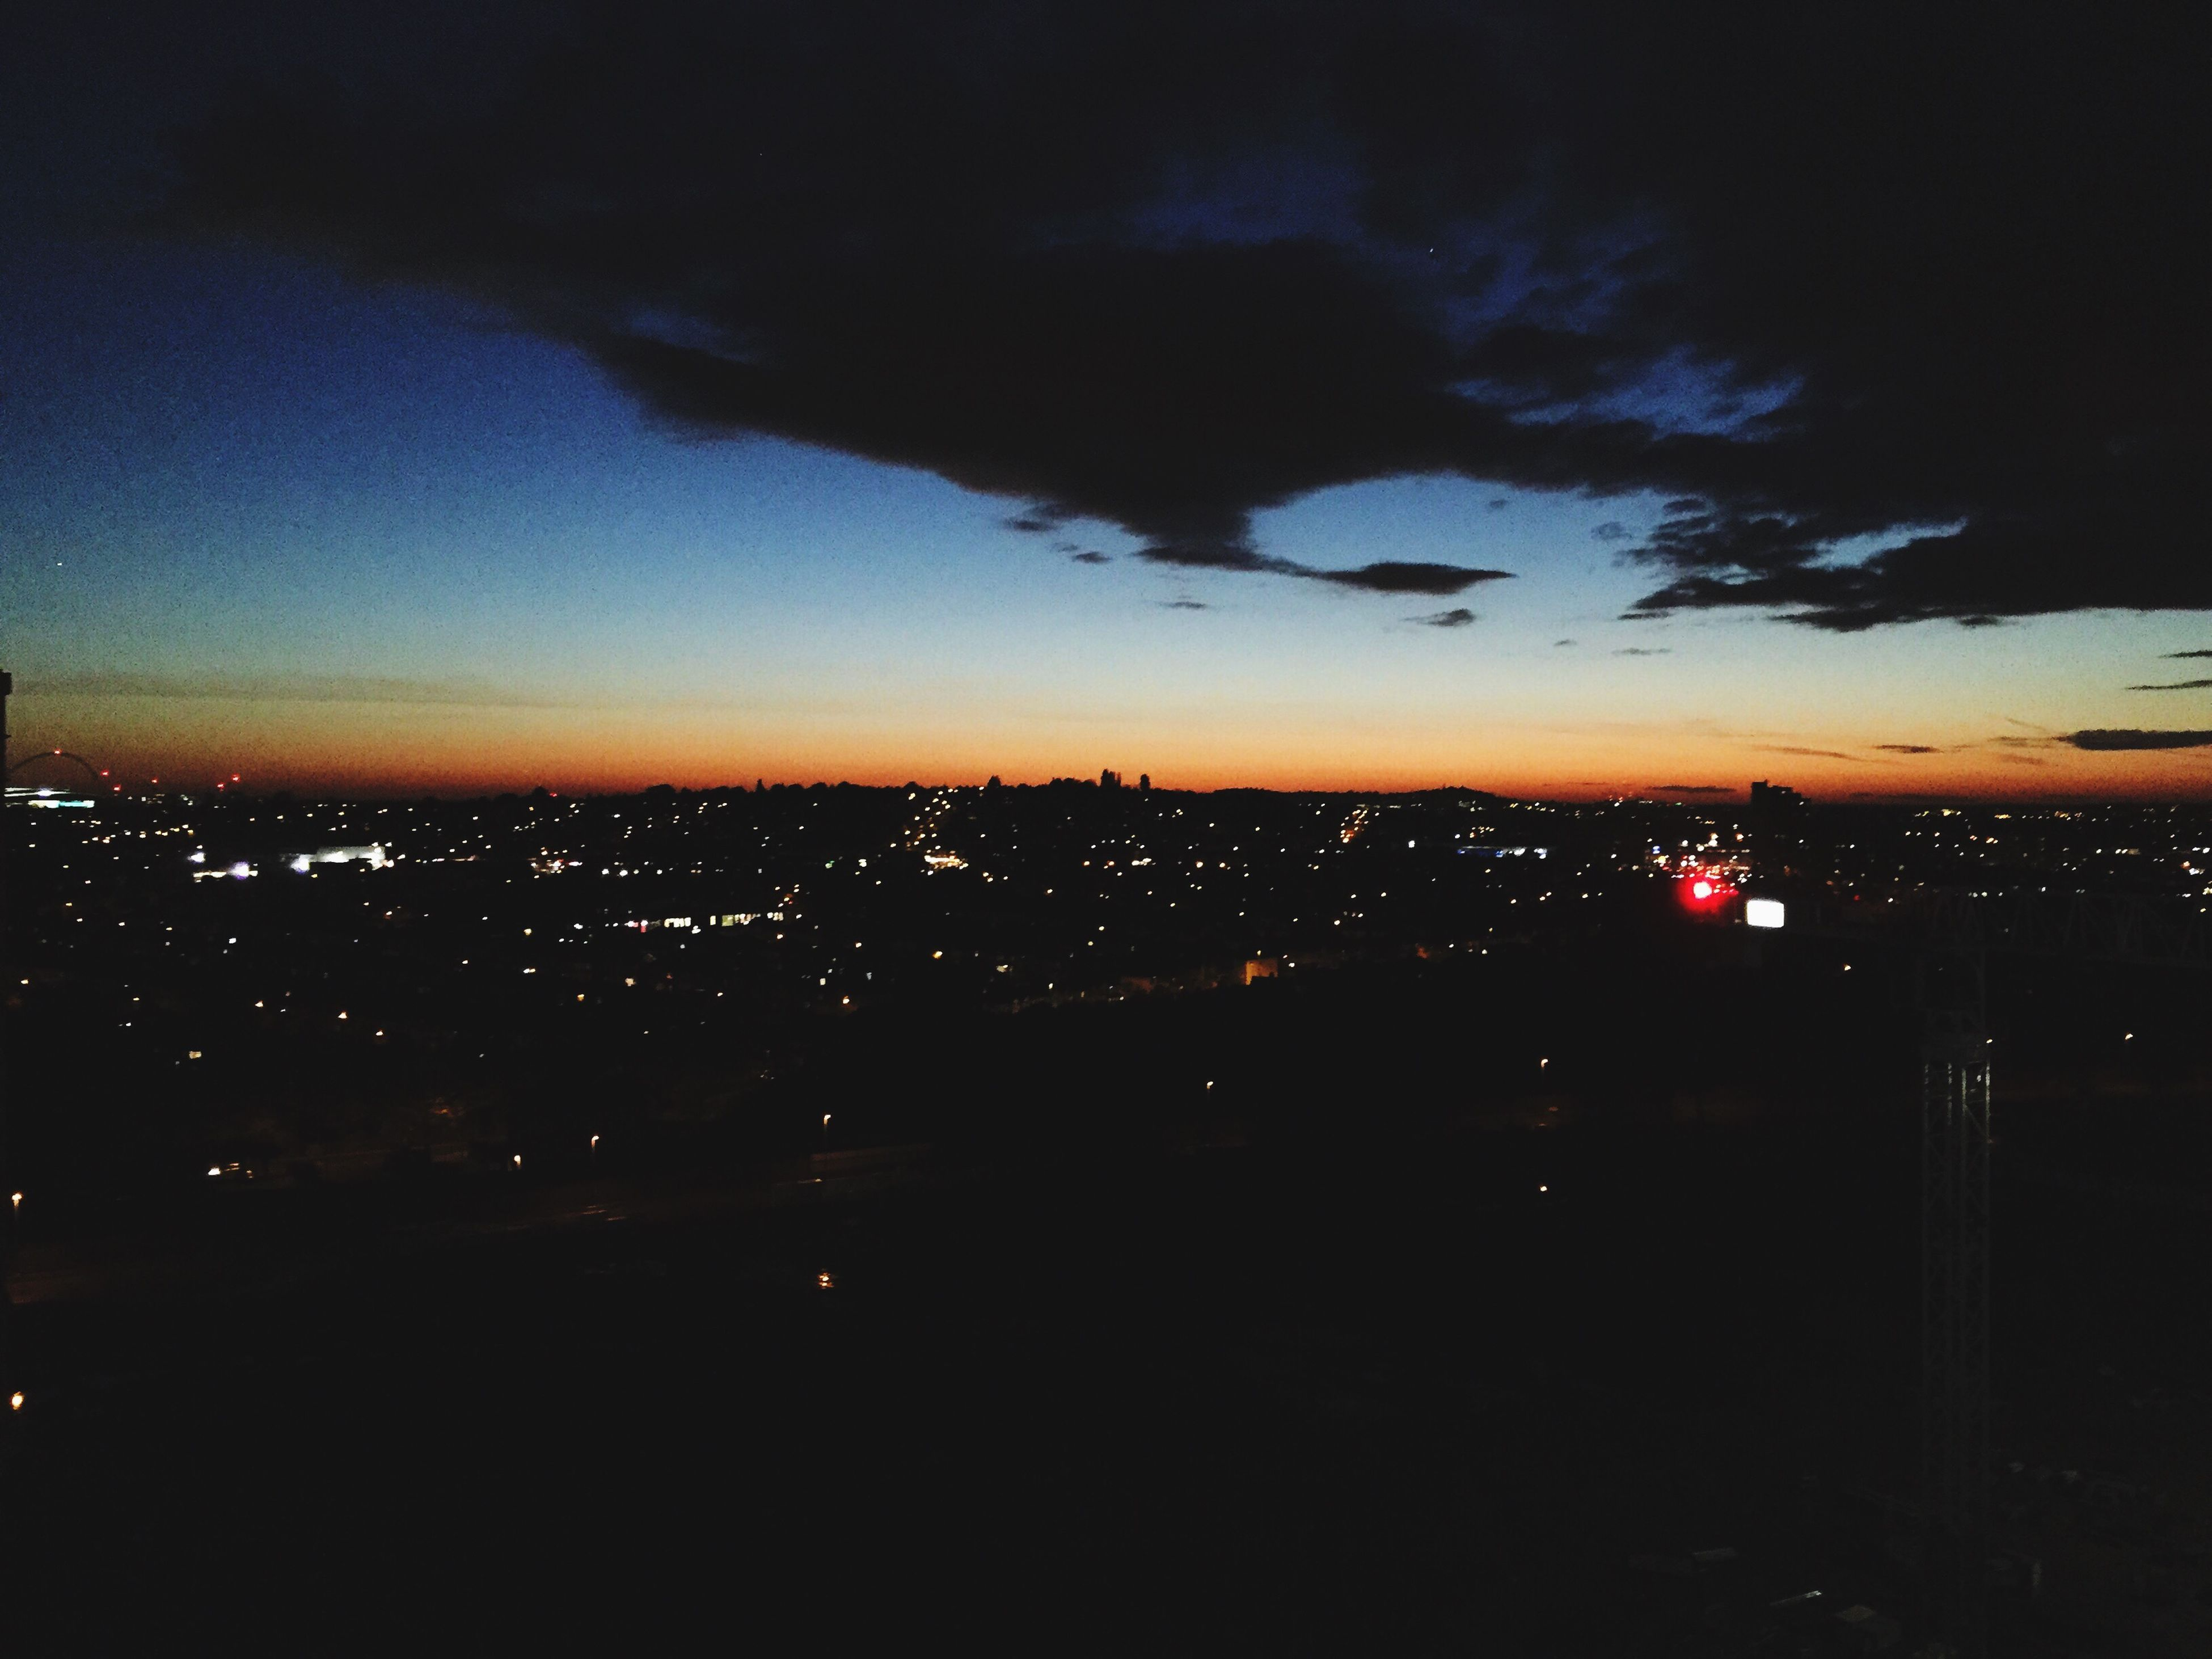 sky, silhouette, nature, sunset, outdoors, no people, beauty in nature, scenics, tree, illuminated, night